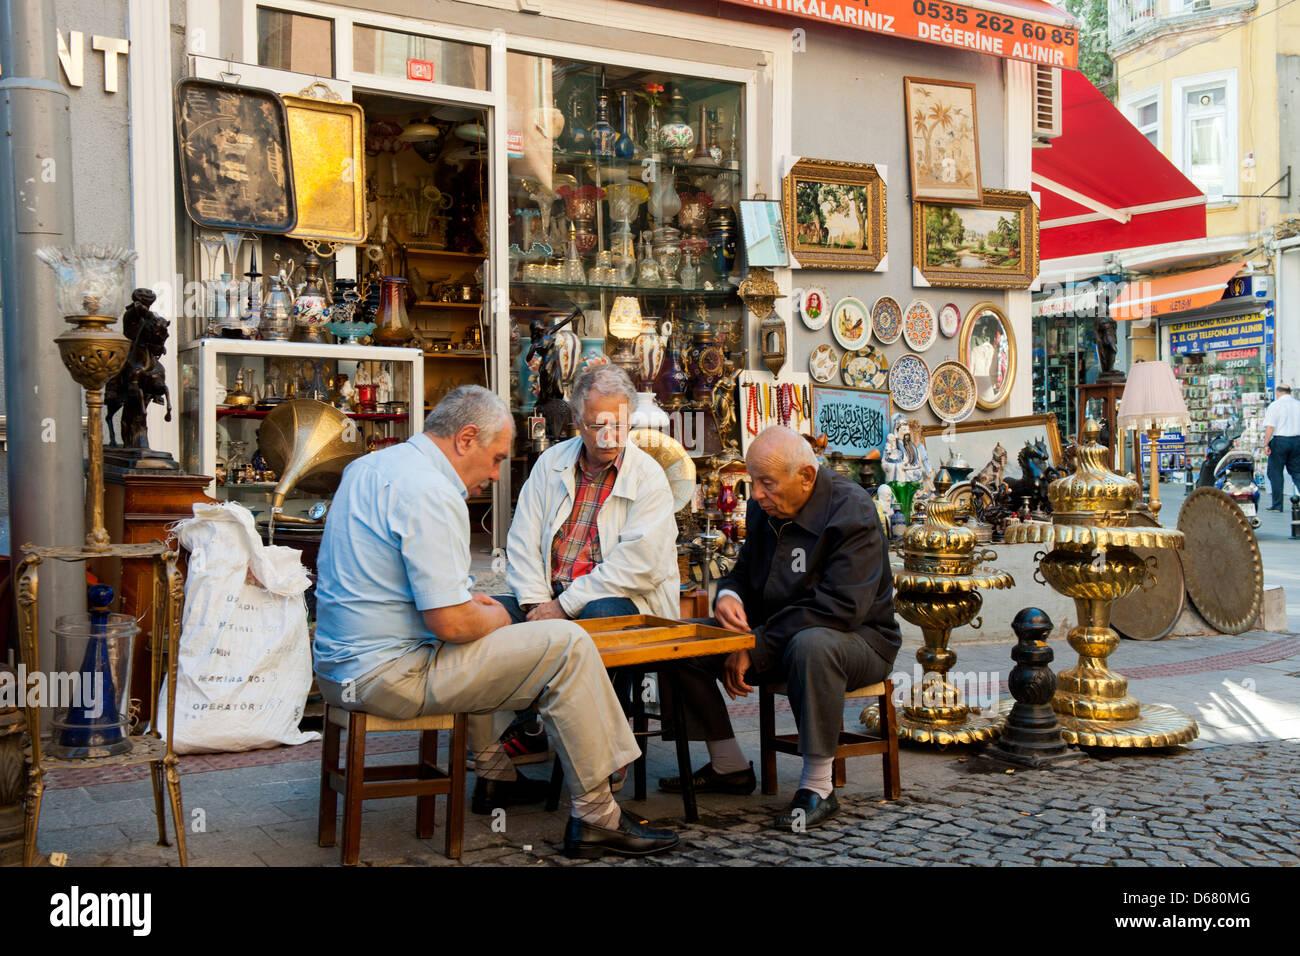 Türkei, Istanbul, Kadiköy, Tellalzade Sokak, Enes Antik, Antiquitüten und Trüdel - Stock Image